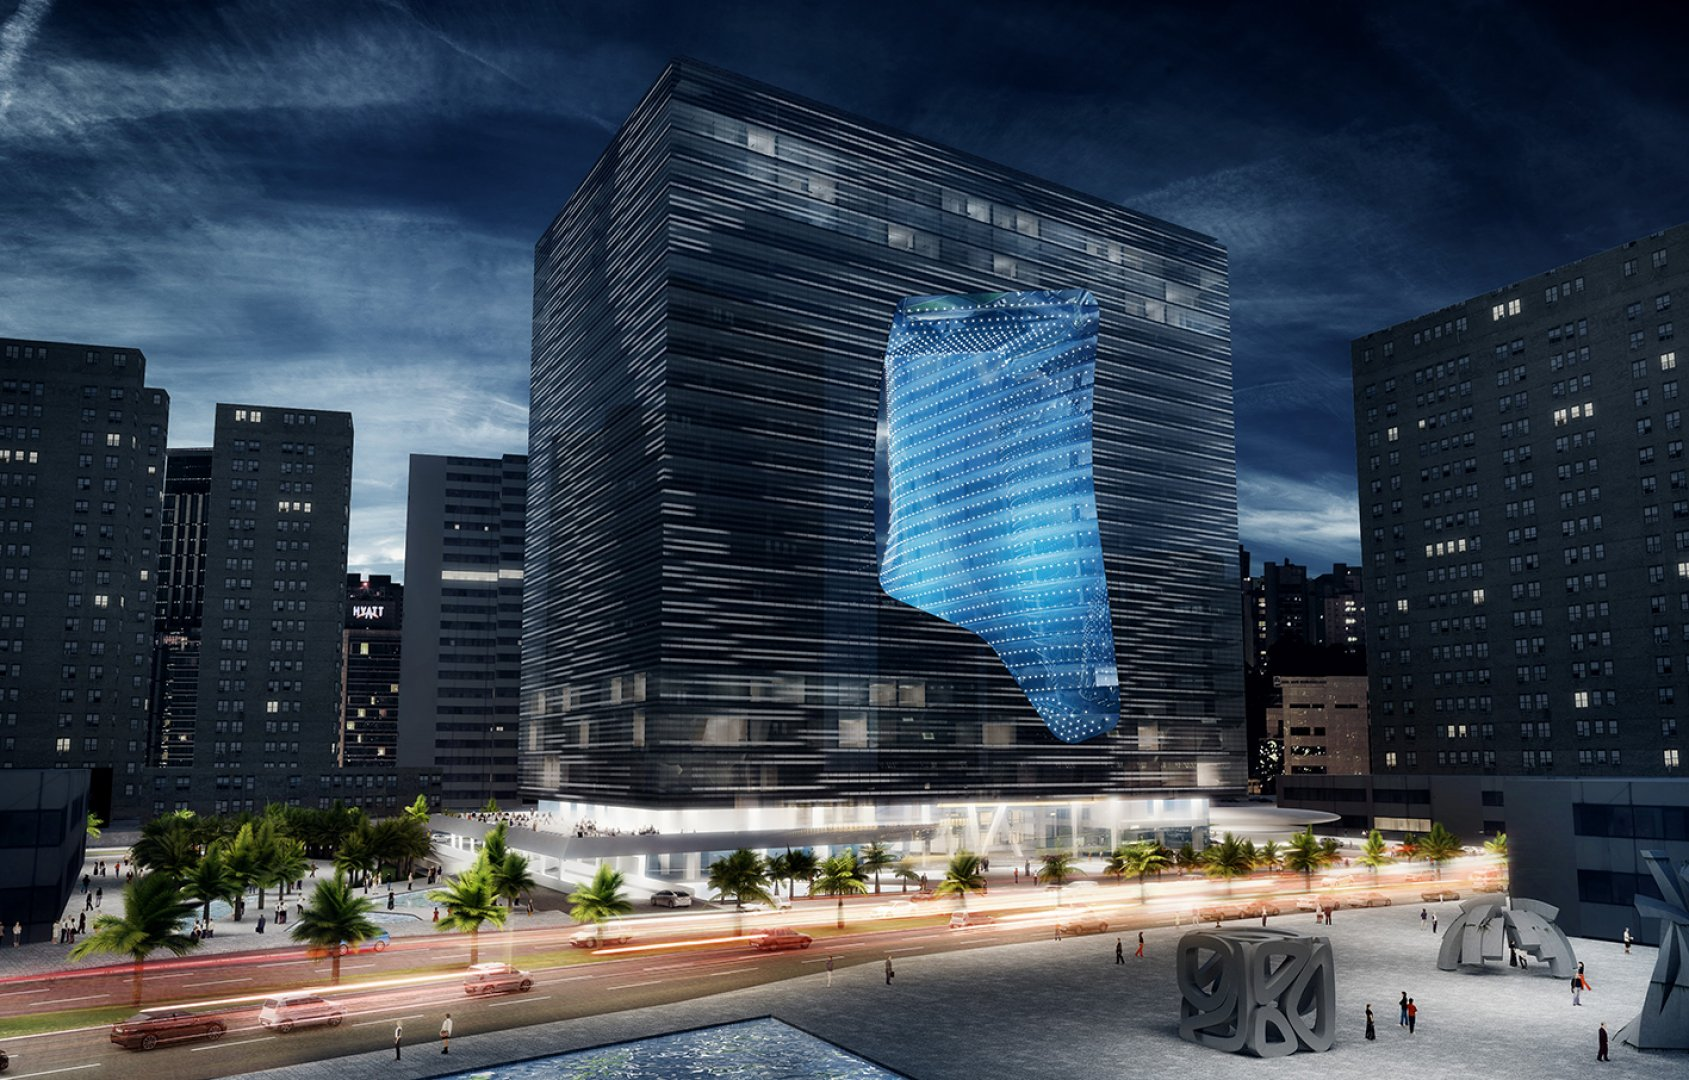 Edifício tem 23.000 m2